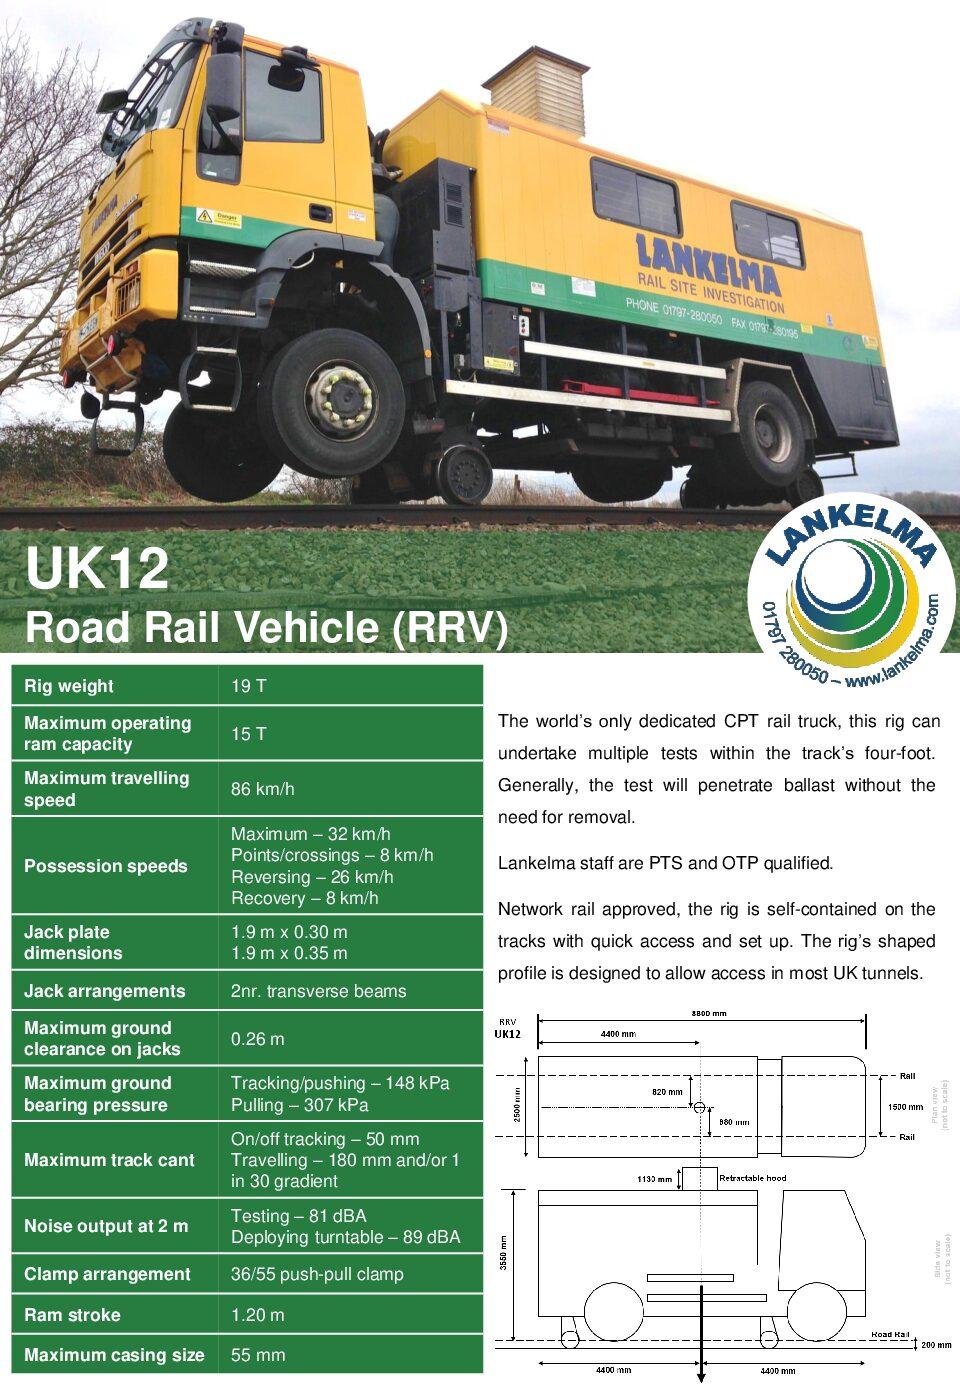 Lankelma Road-Rail Vehicle (UK12) Data Sheet